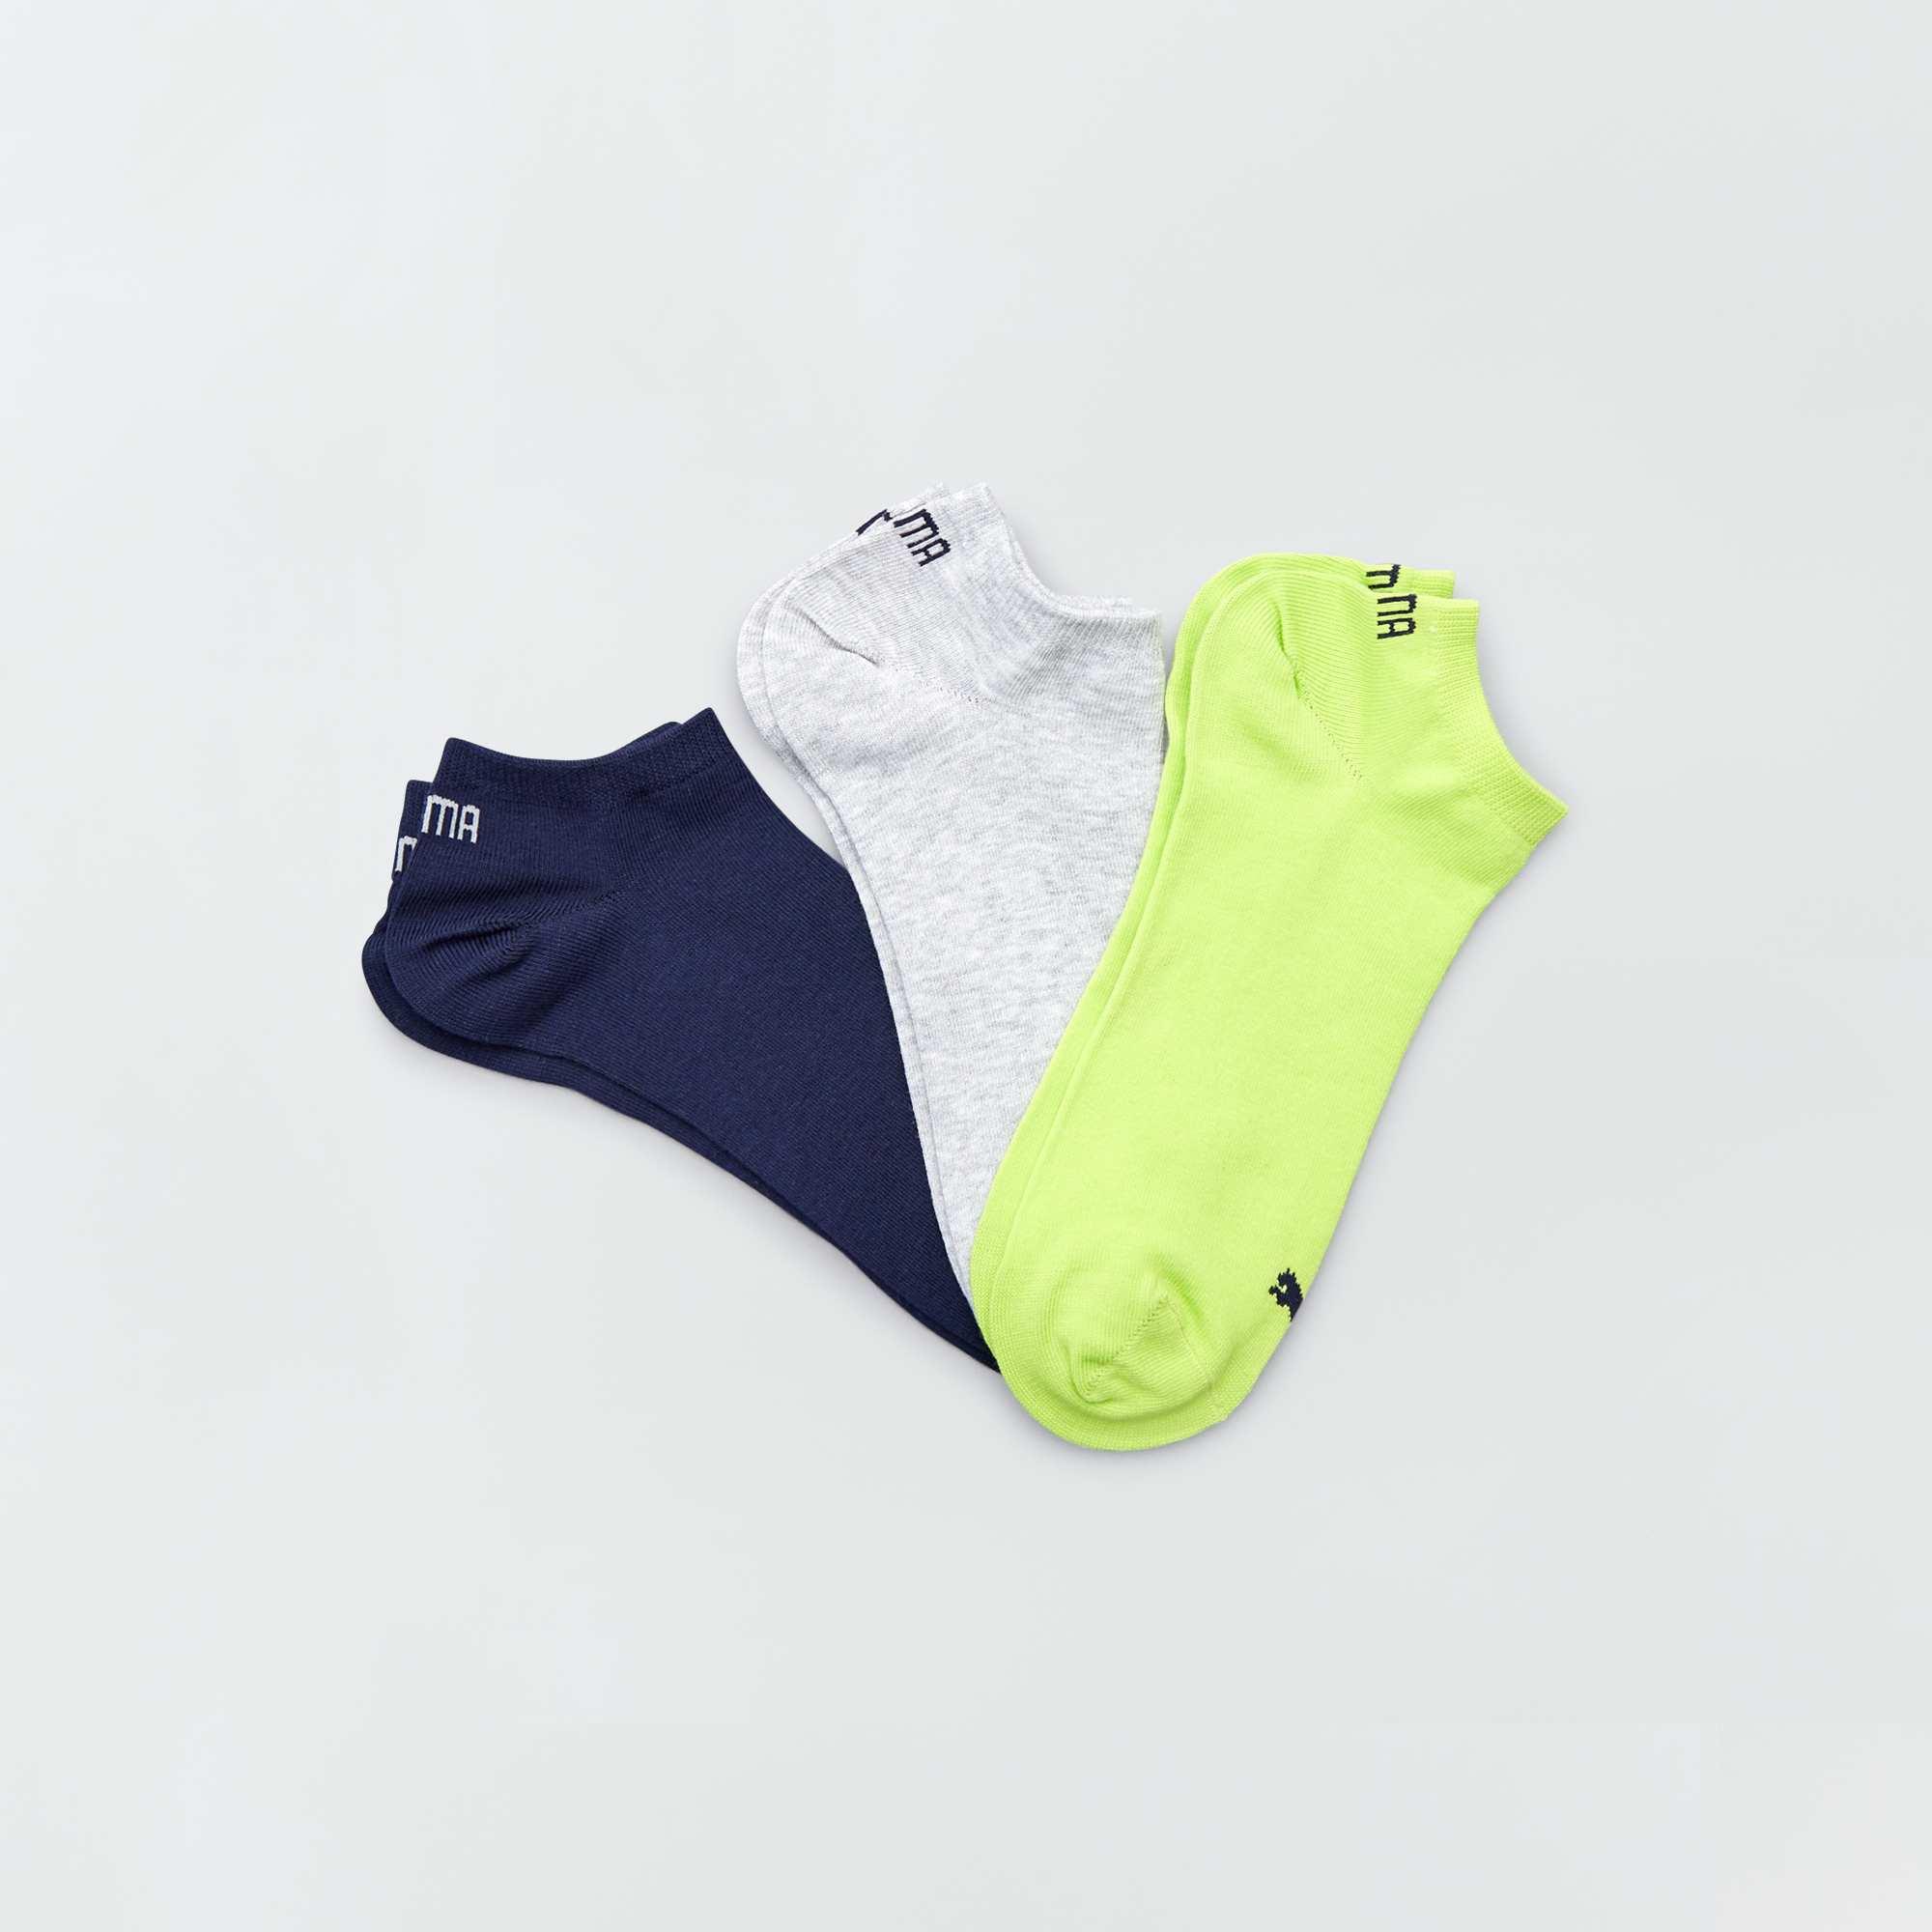 fb2a6b03c0f15 Lote de 3 pares de calcetines tobilleros  Puma  VERDE Hombre. Loading zoom